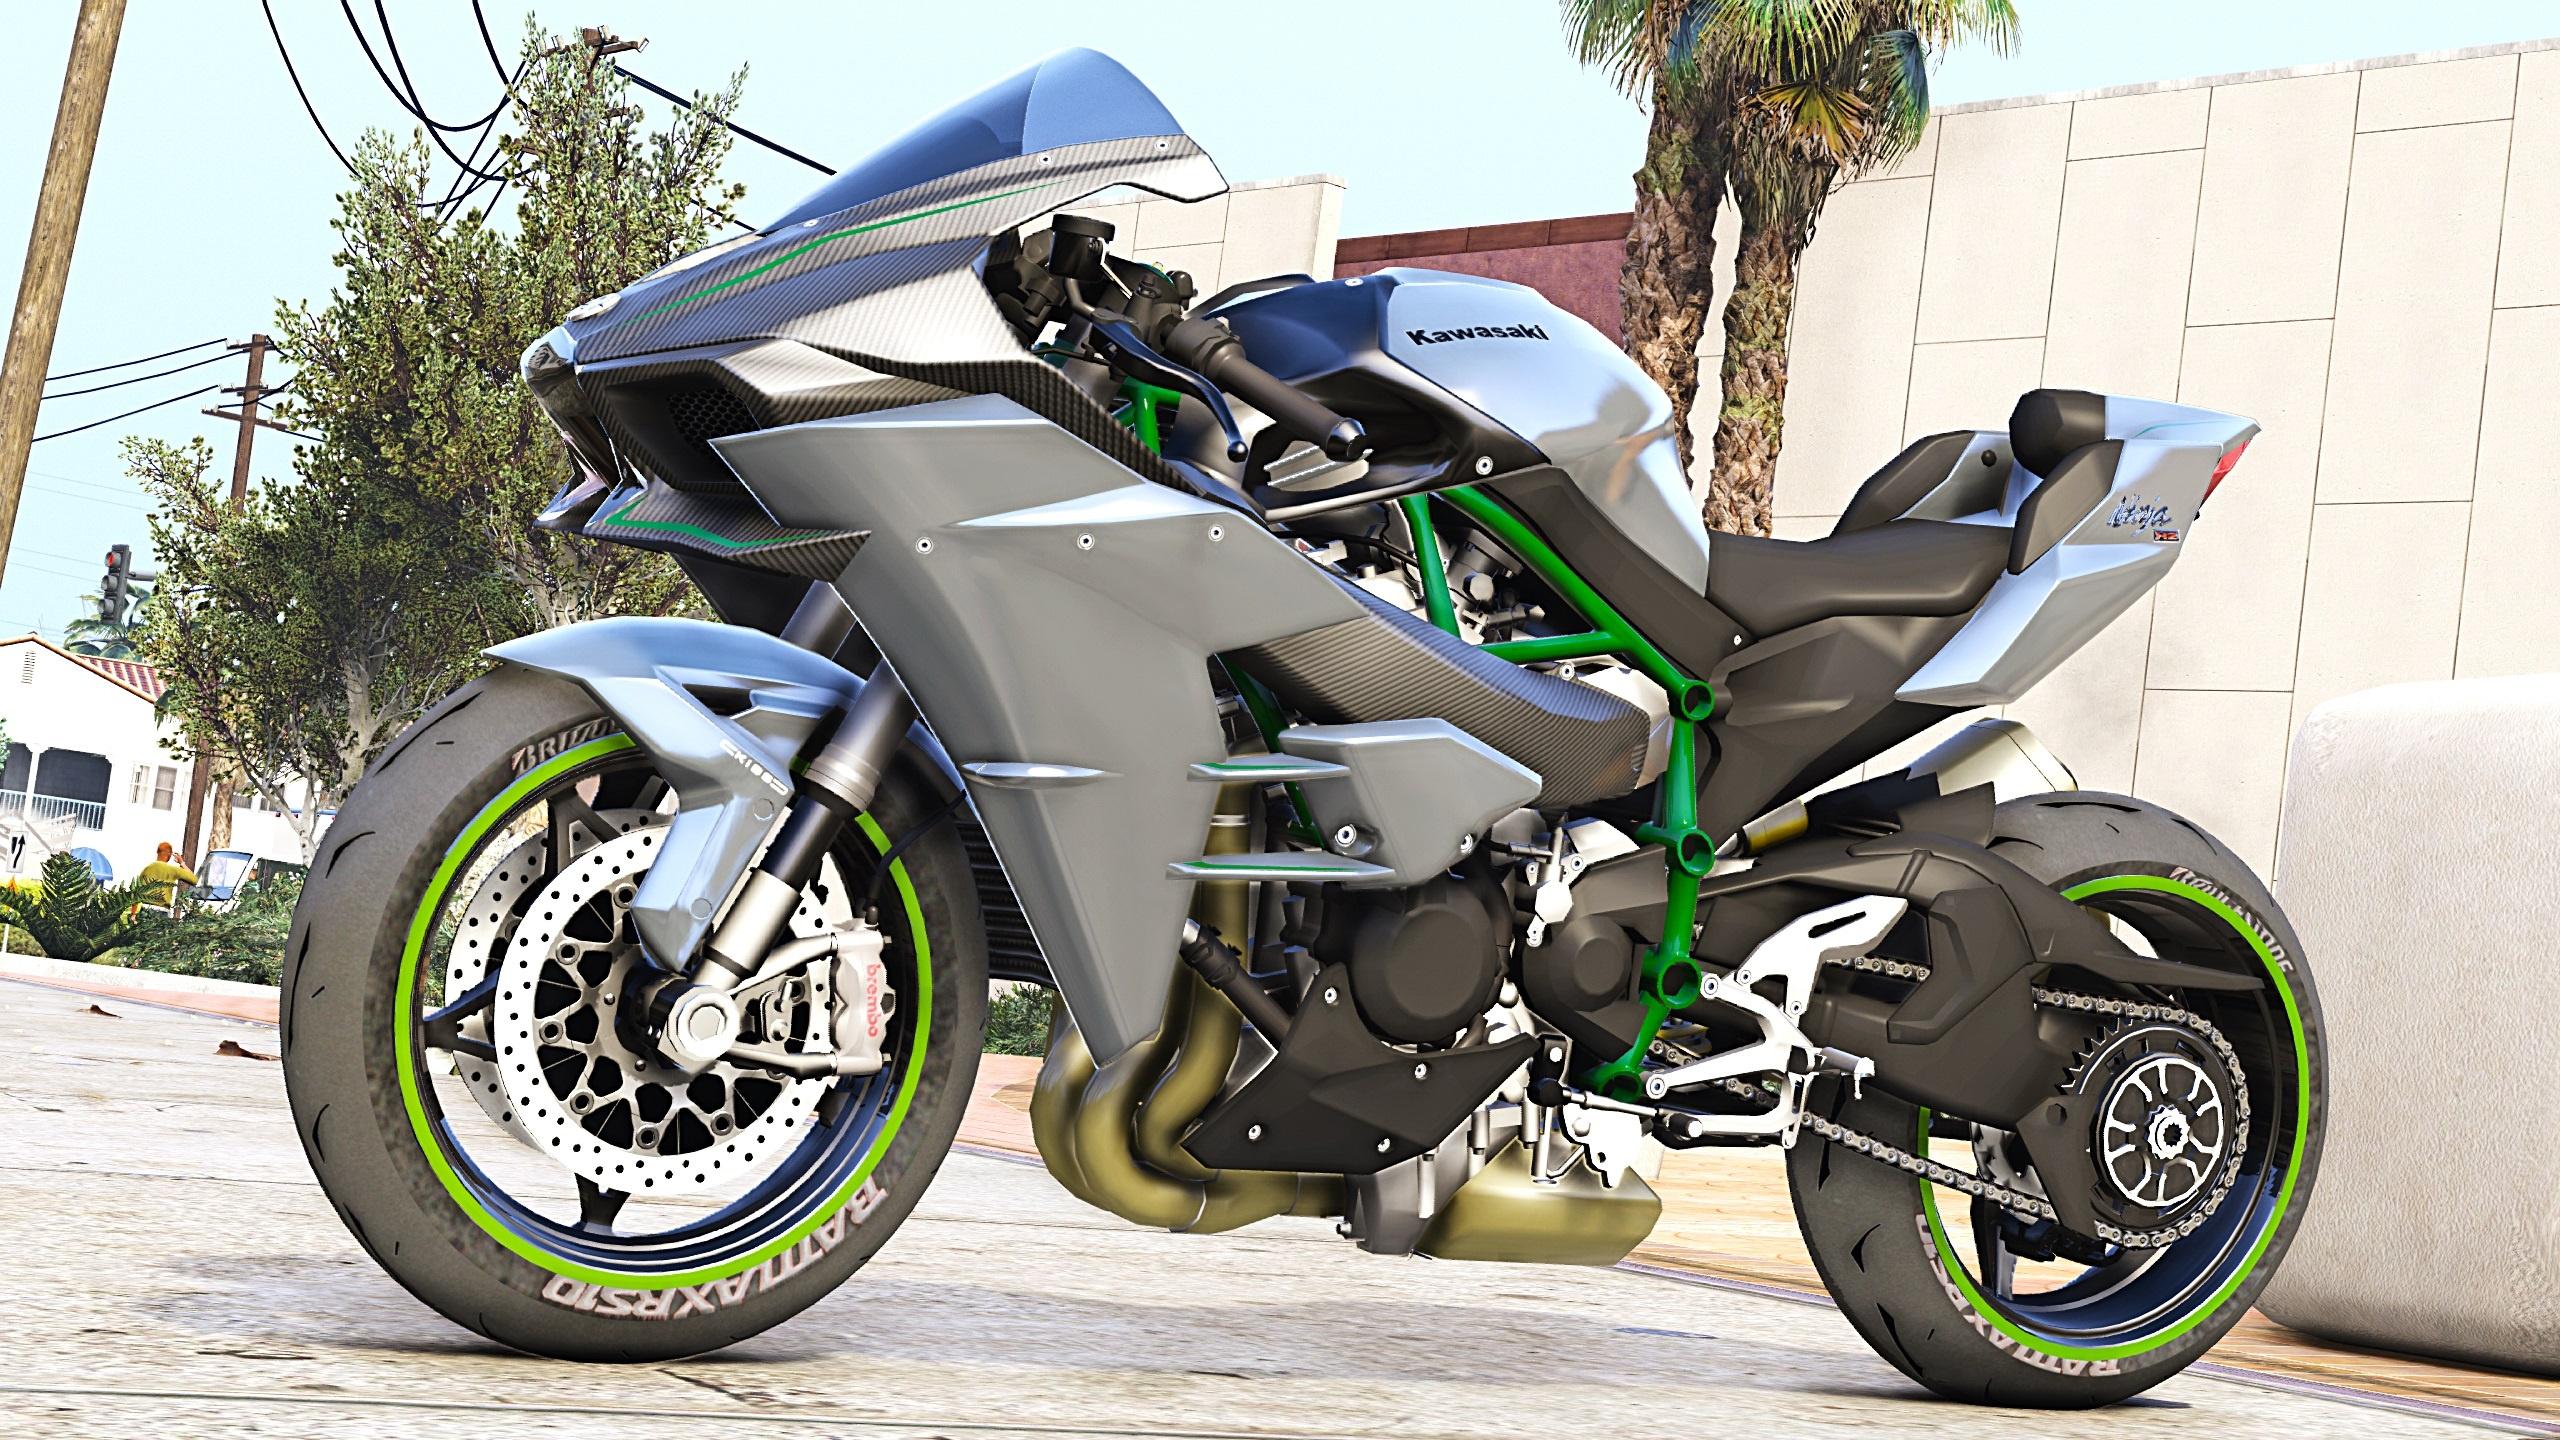 2017 Kawasaki H2 Carbon Addons Tuning Gta5 Modscom